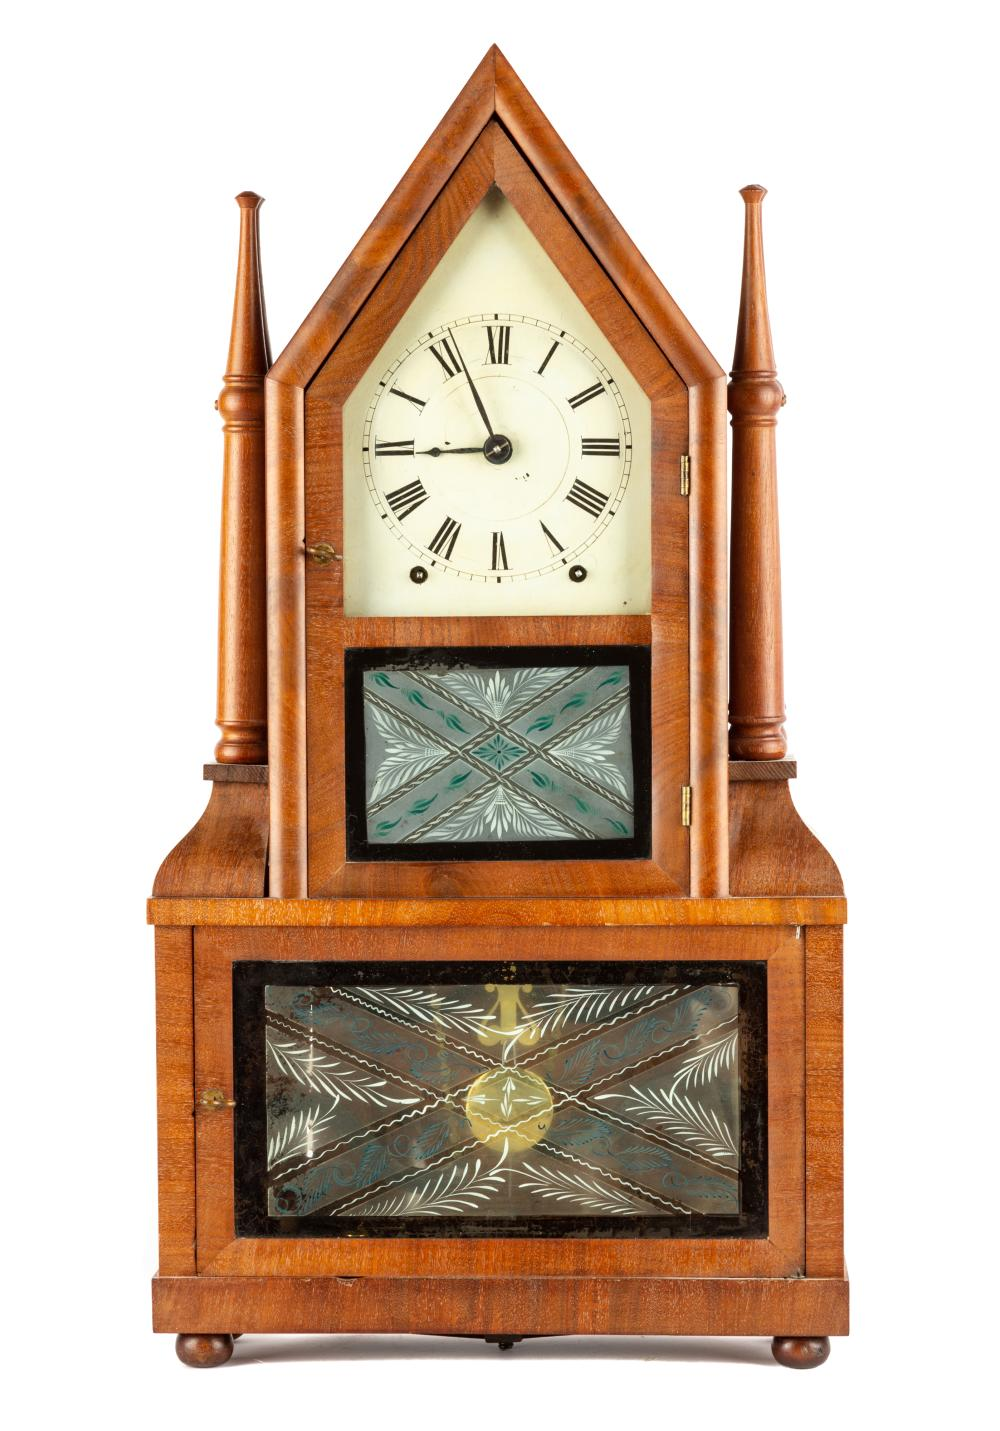 Birge & Fuller Four Candlestick Steeple on Steeple Clock